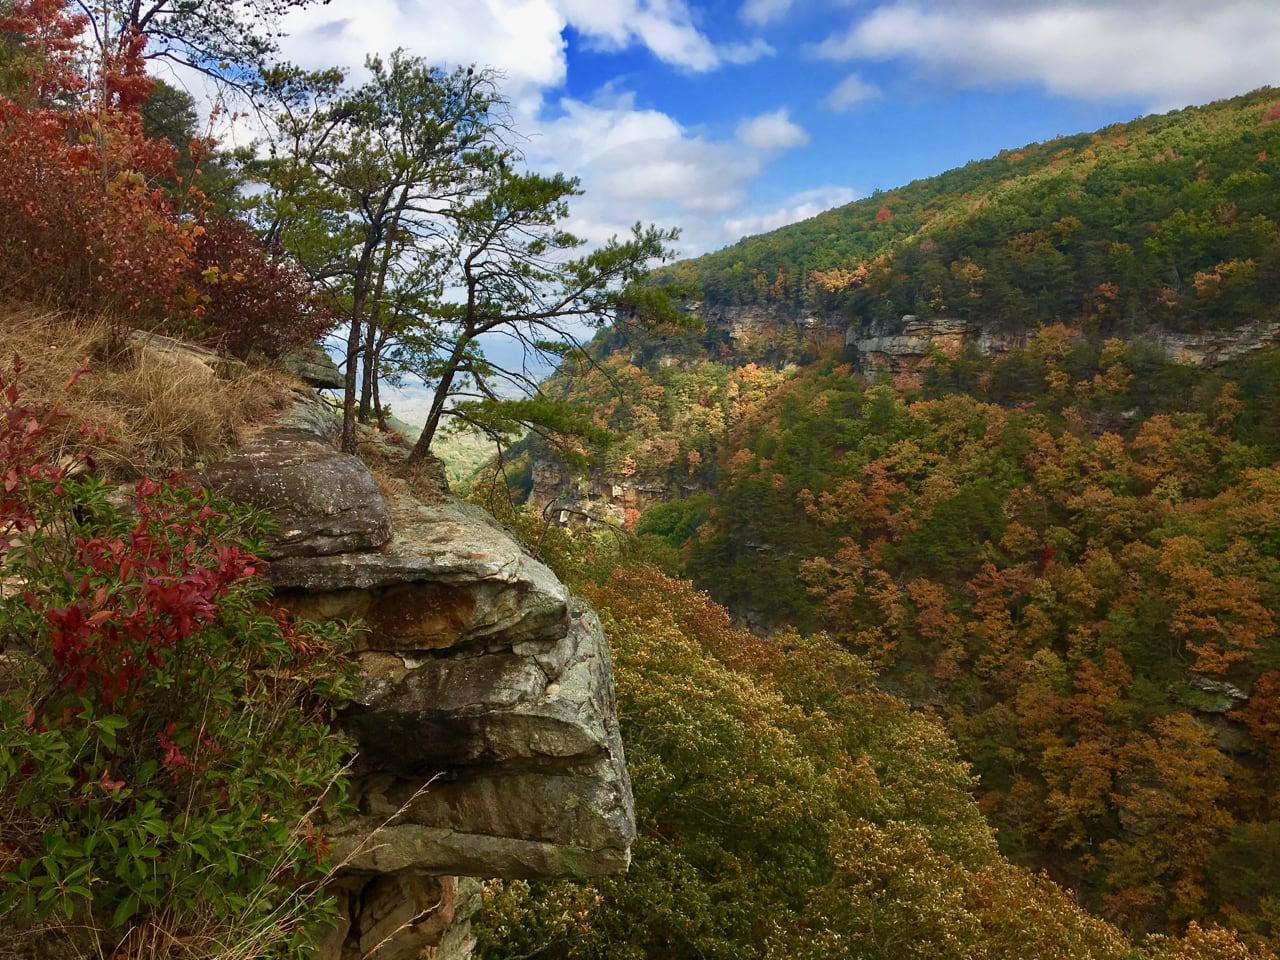 Cloudland Canyon in northwest Georgia